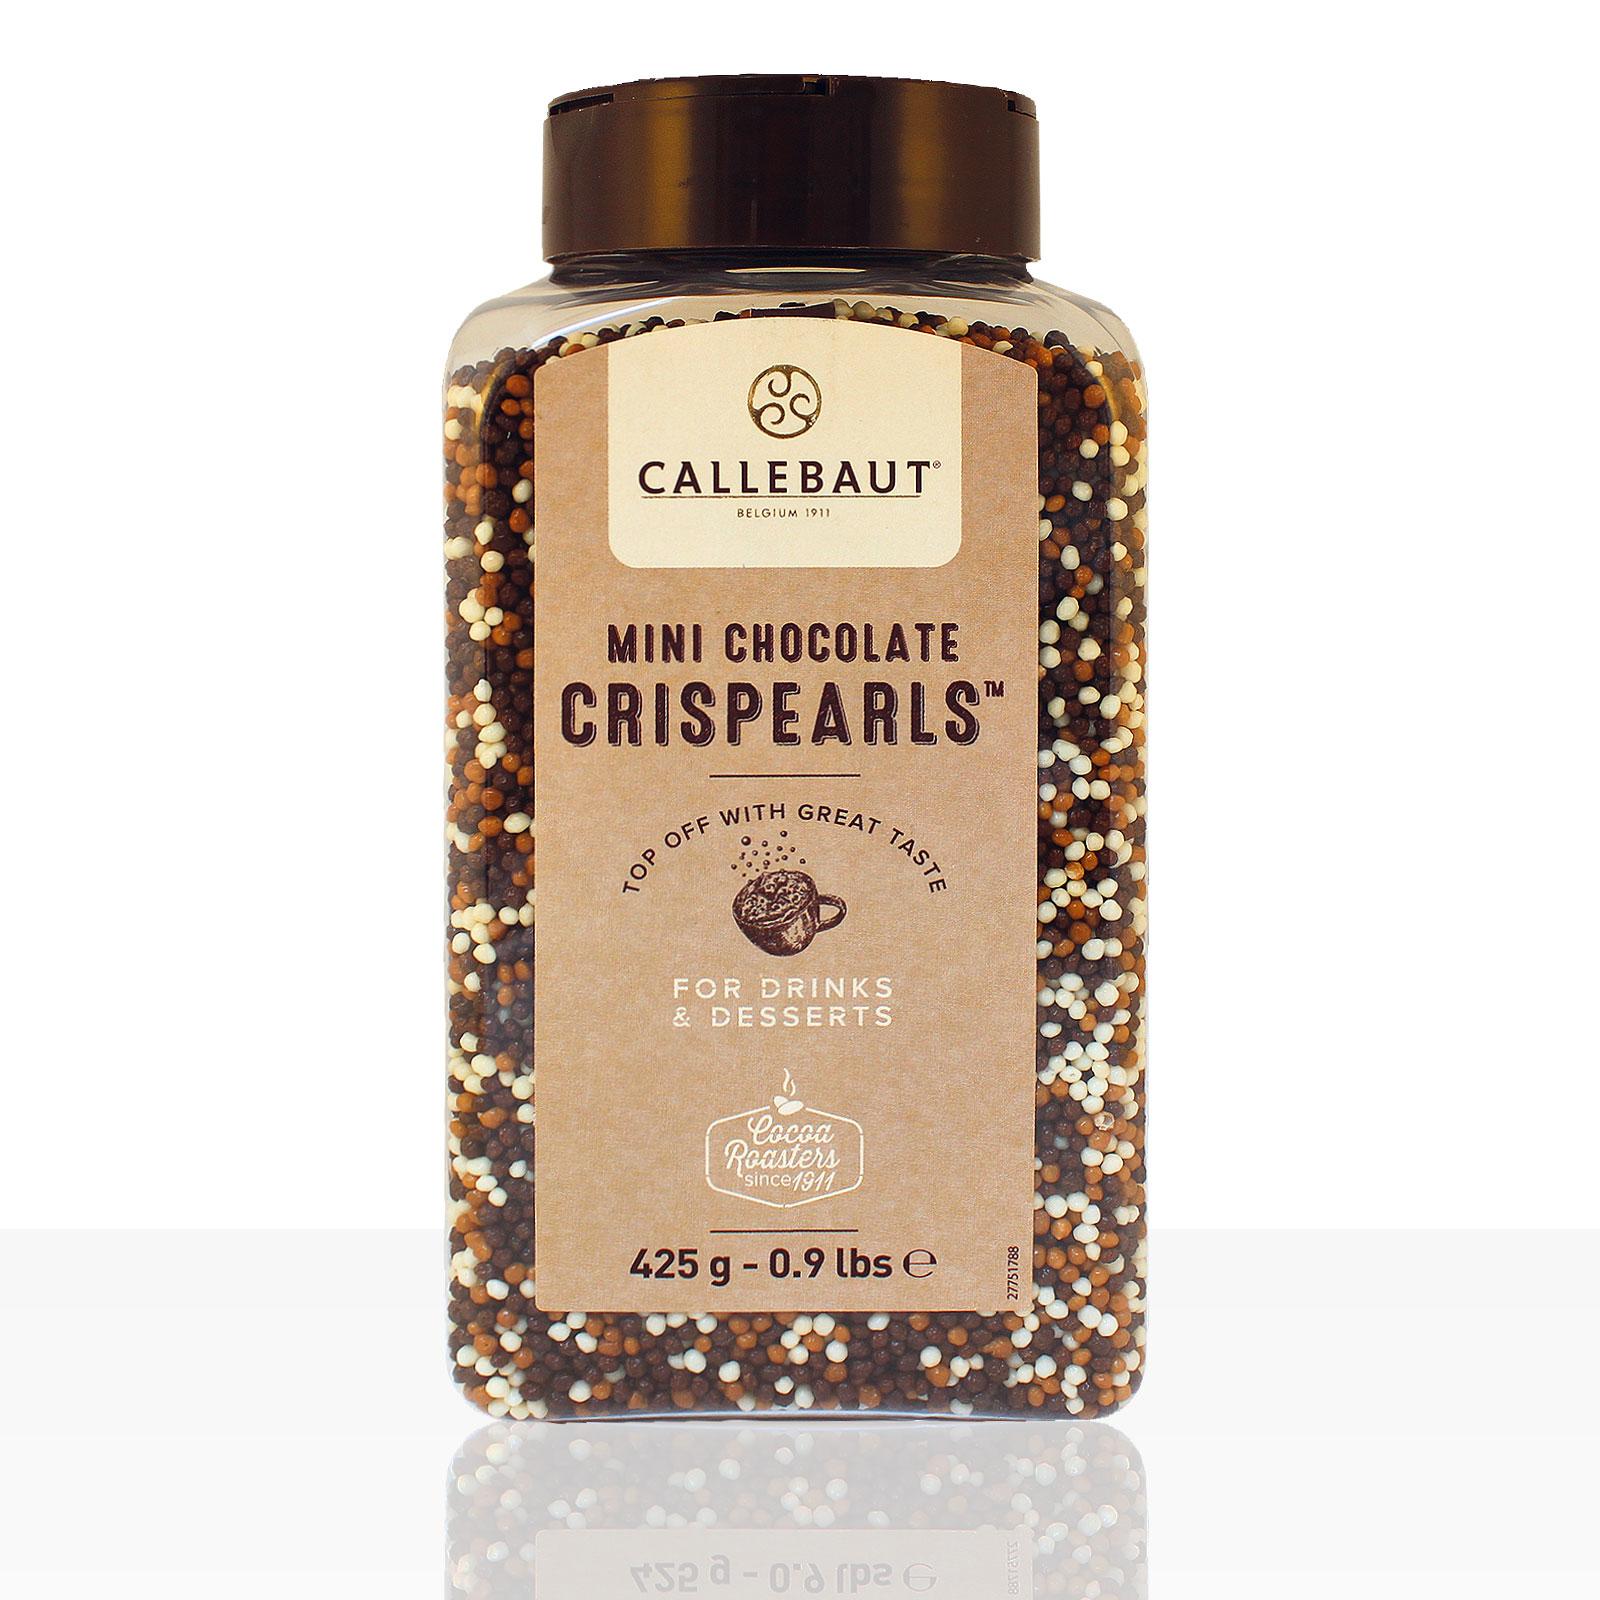 Callebaut Mini Chocolate Crispearls Schokokügelchen 425g